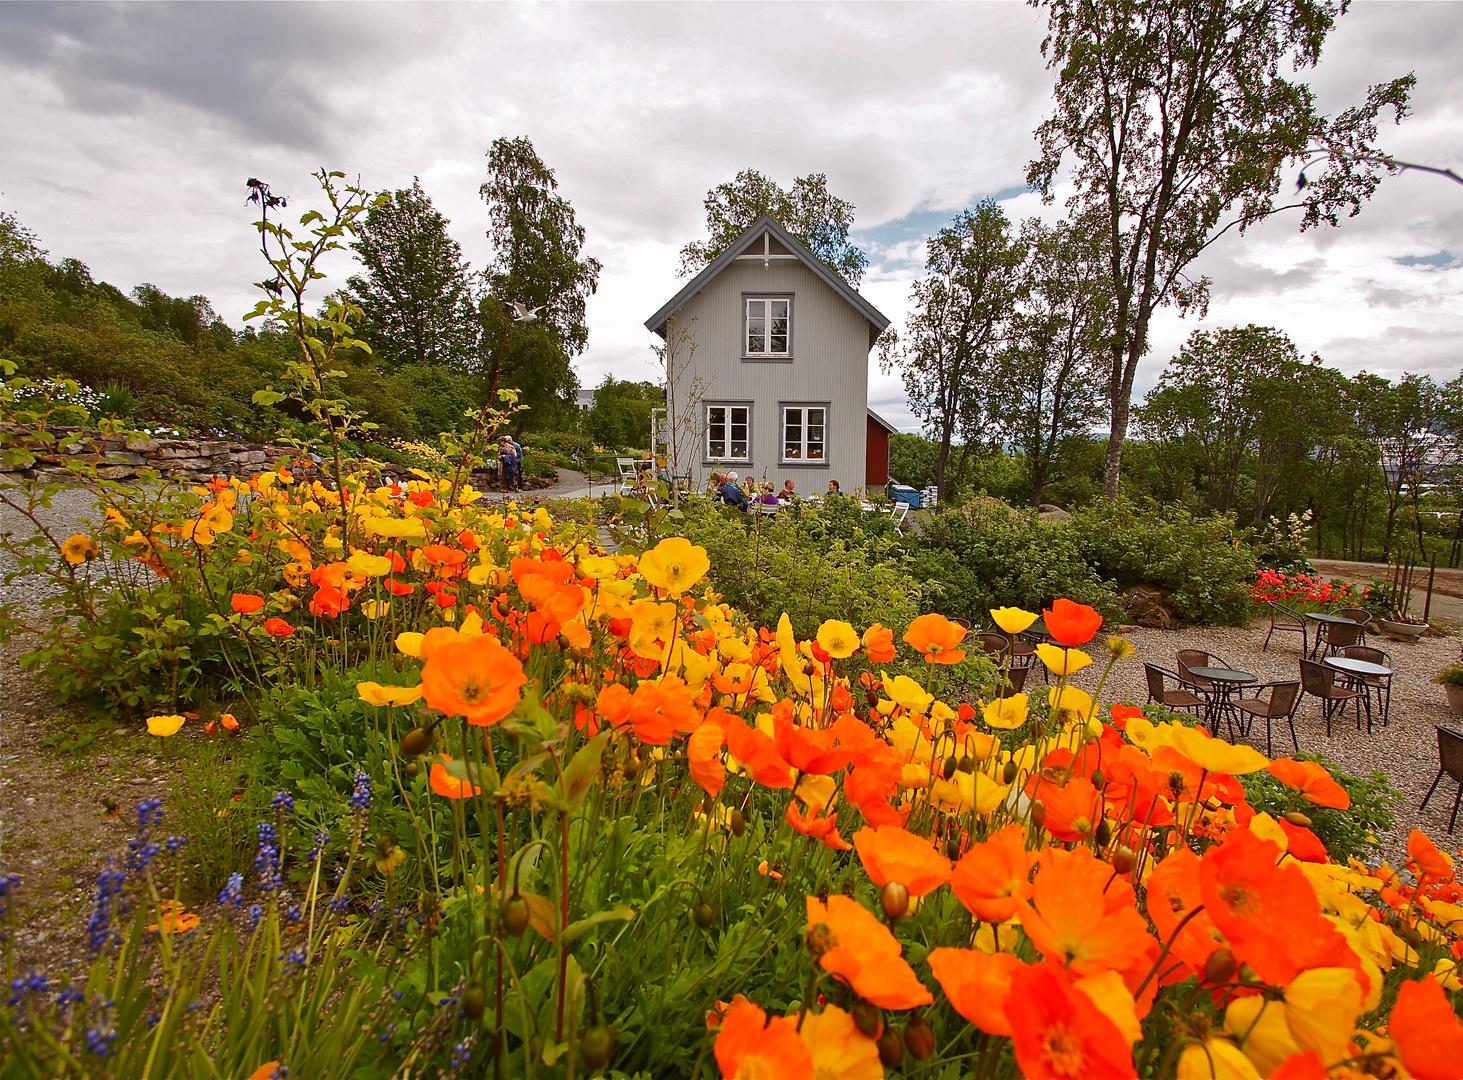 Arktisch Botanischer Garten in Tromsö